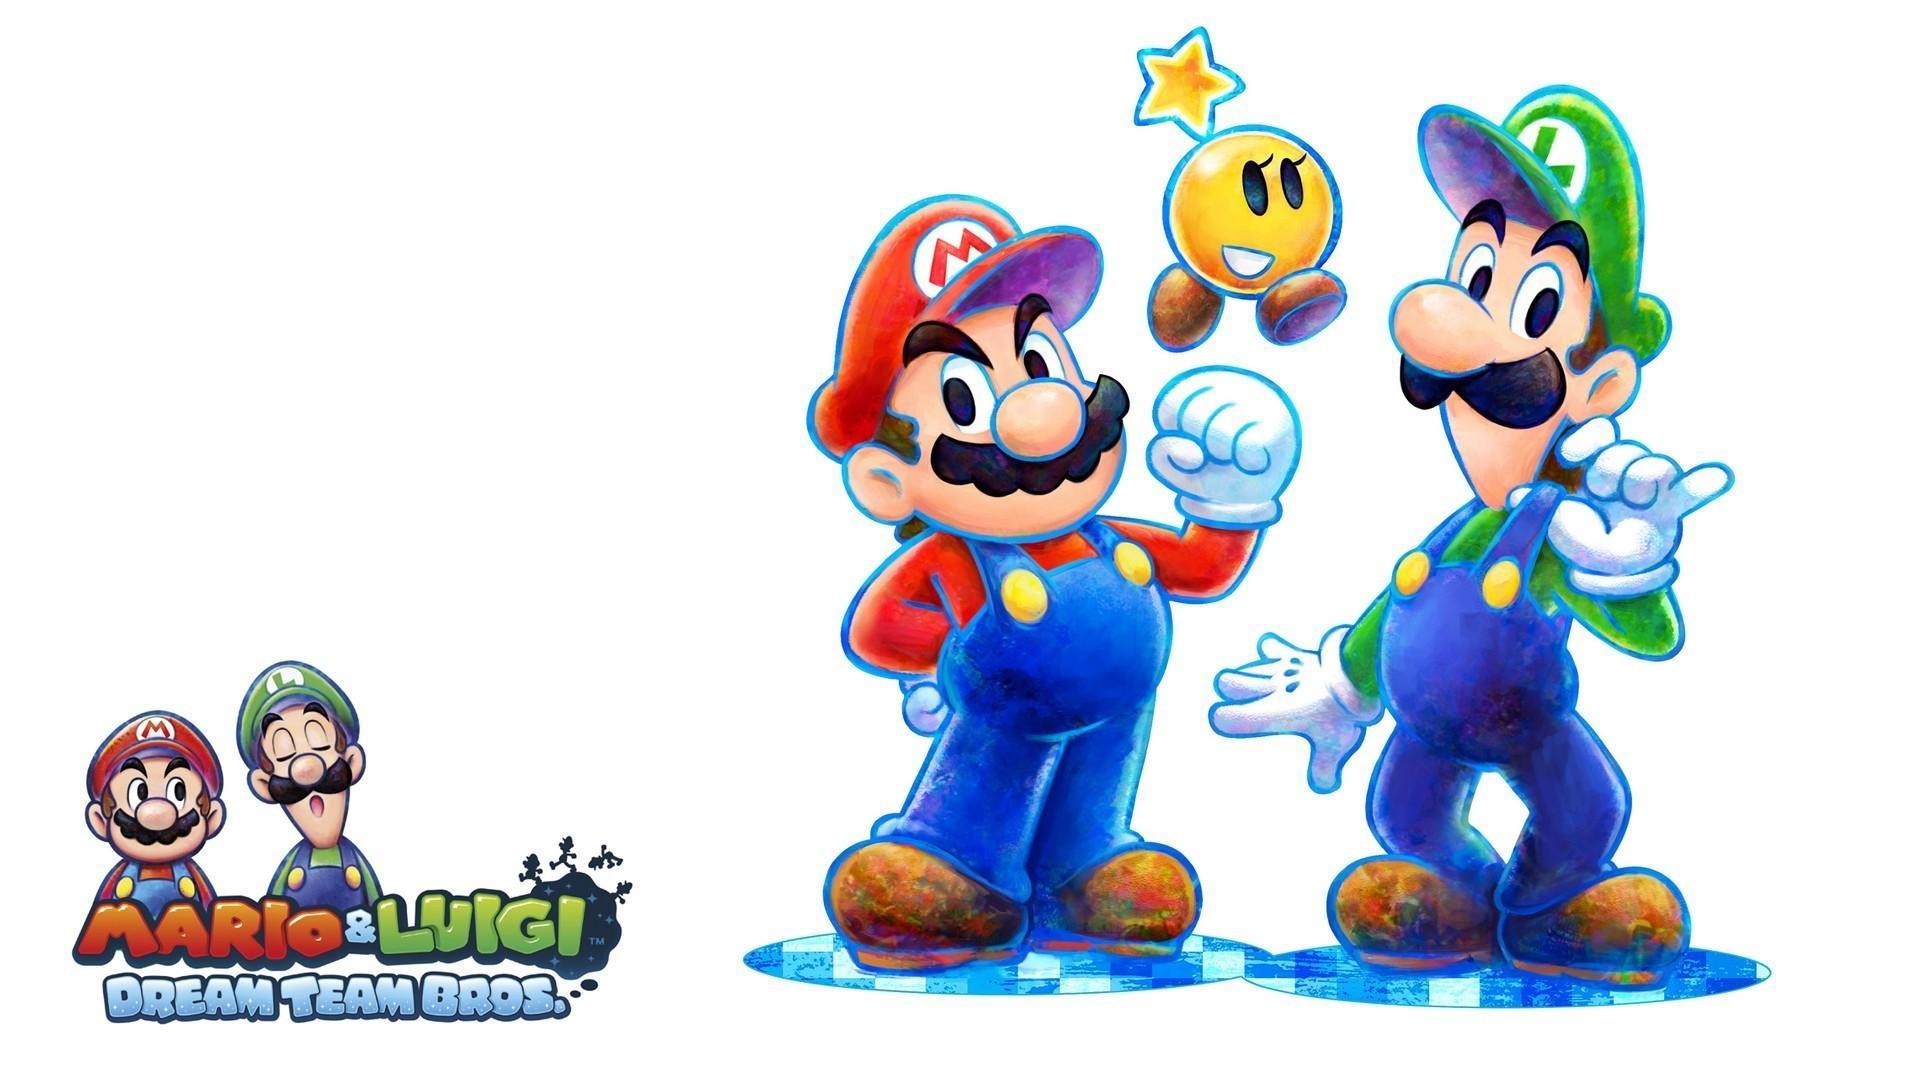 Mario Luigi Dream Team At First Glance D20crit